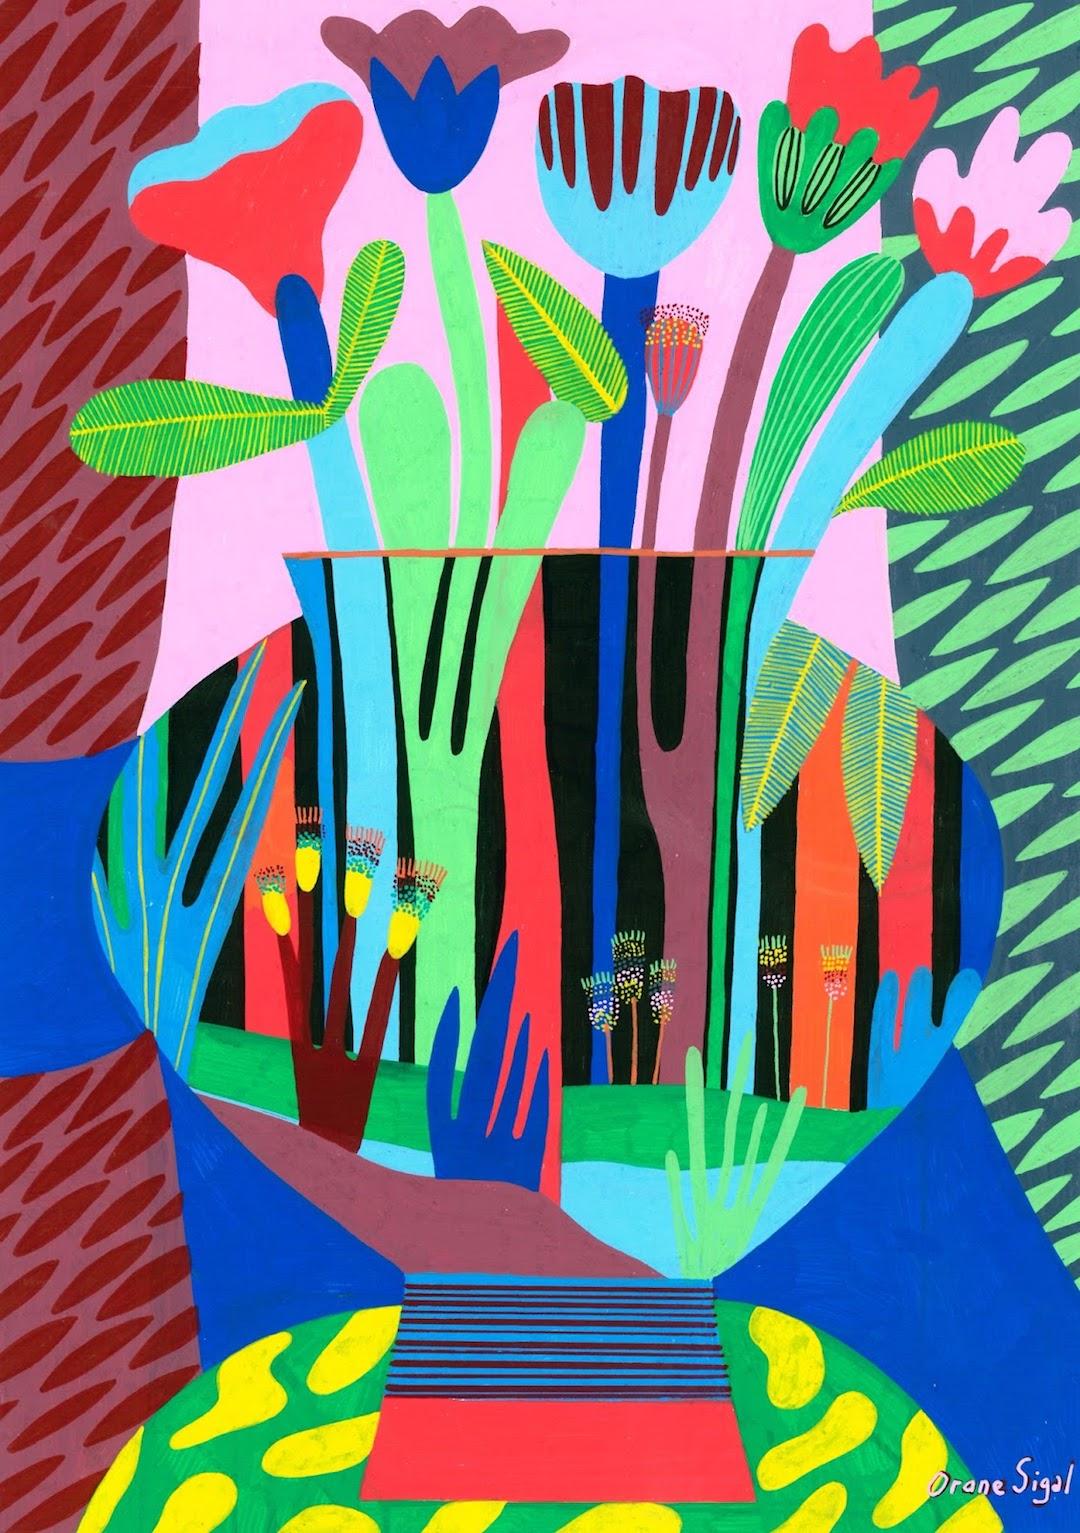 Vibrant color palette jungle illustration by Orane Sigal